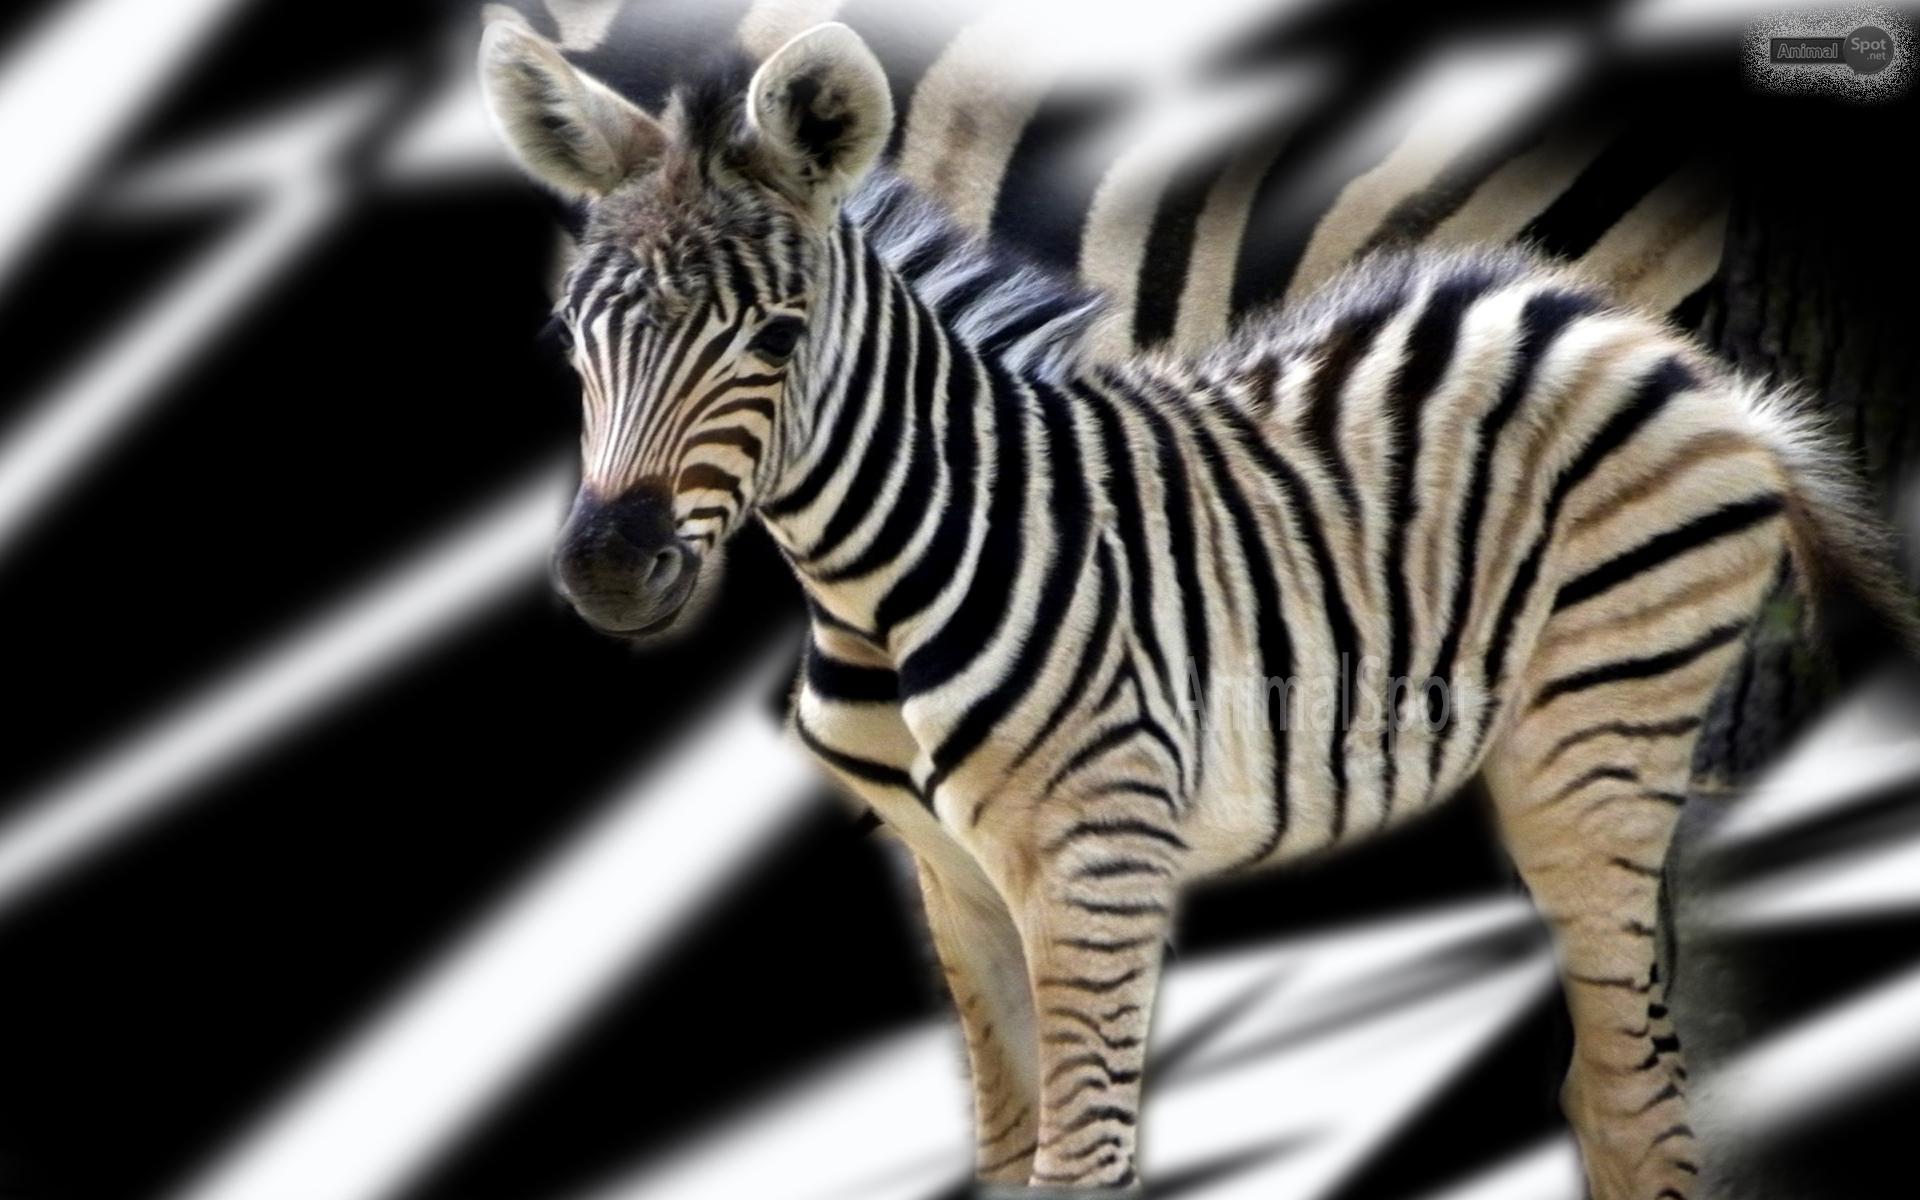 Zebra Wallpapers - Animal Spot